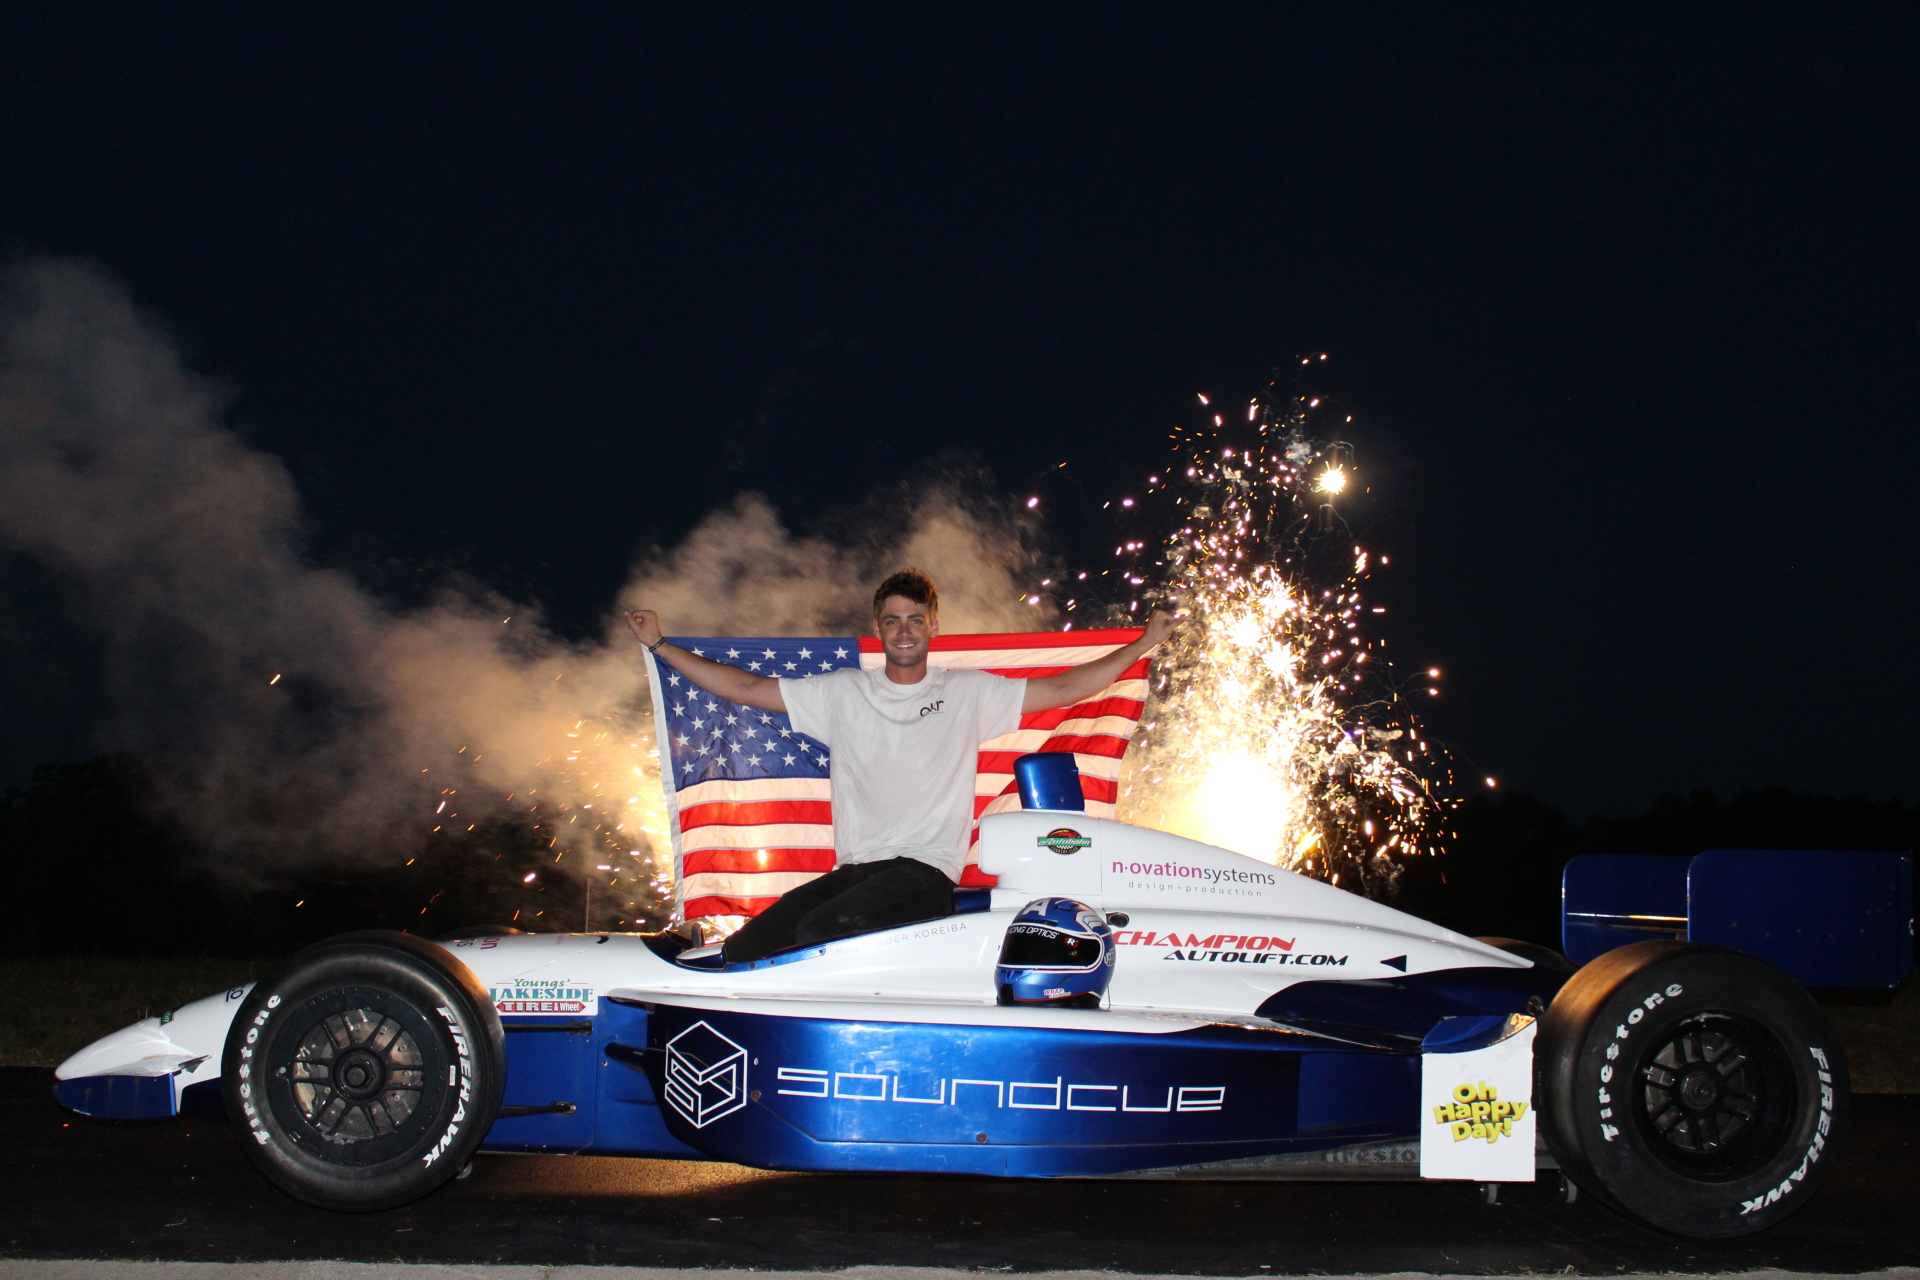 Alexander Koreiba IndyCar Driver